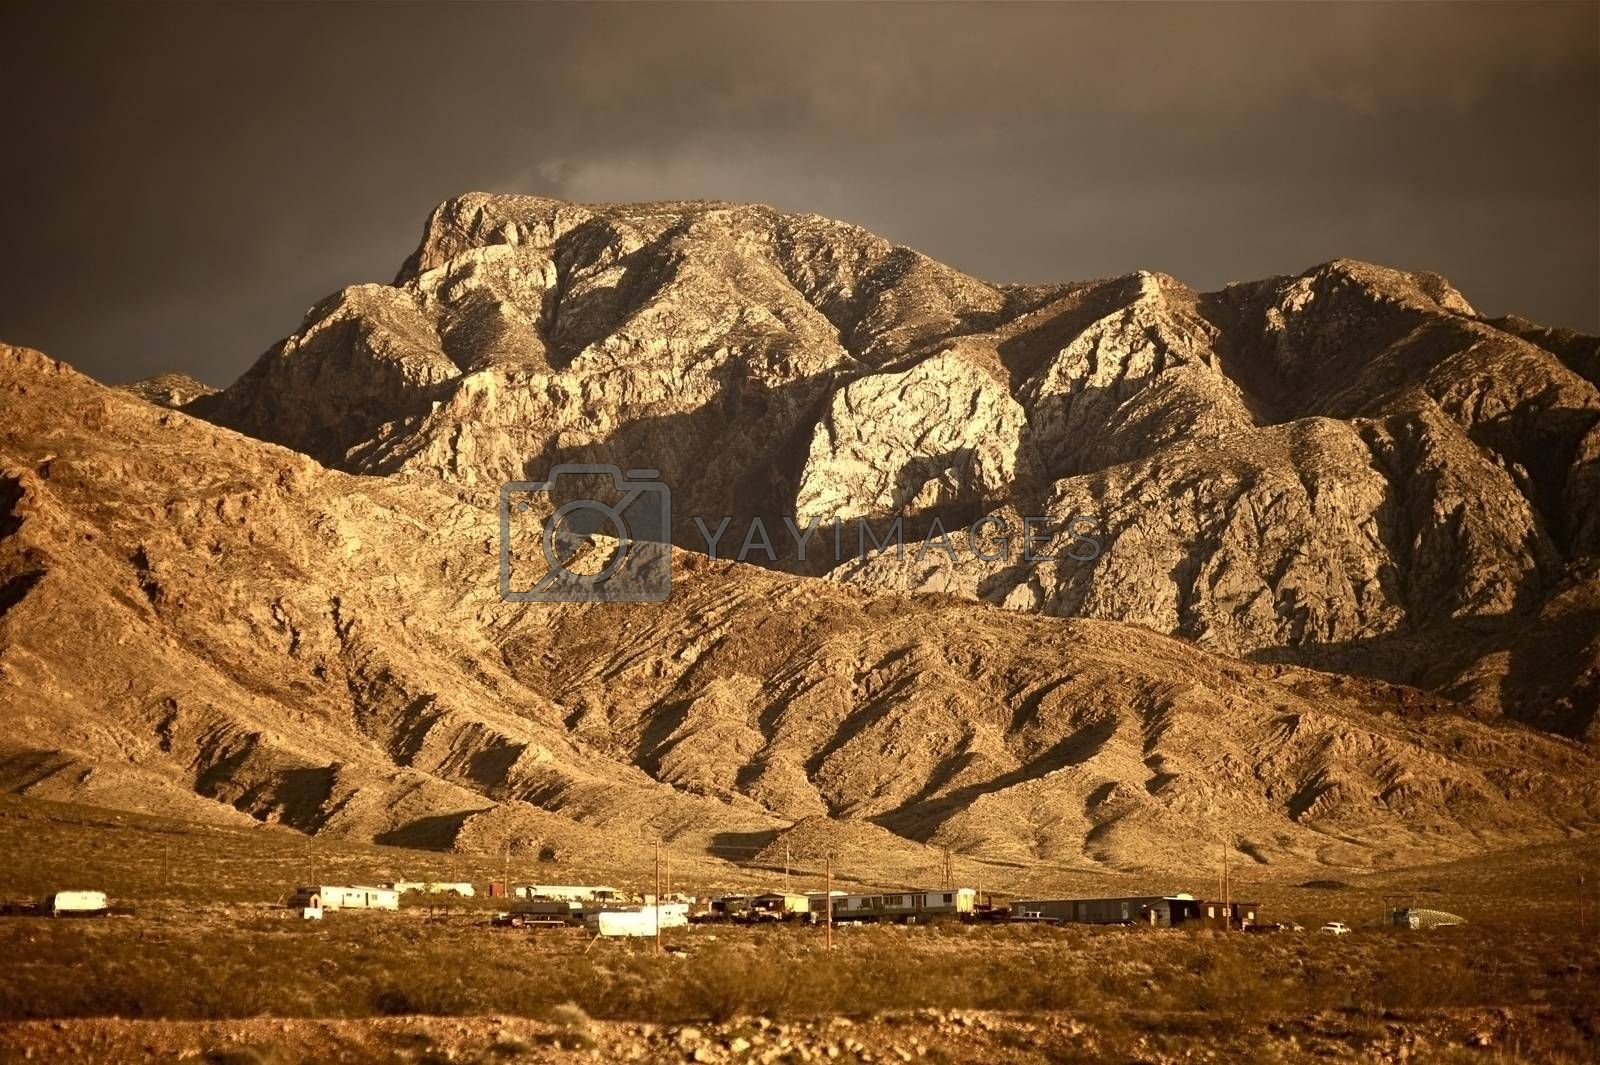 Arizona Landscape - Arizona Mountains and Canyons. Arizona USA. Arizona - Nevada State Border. Some Mobile Homes